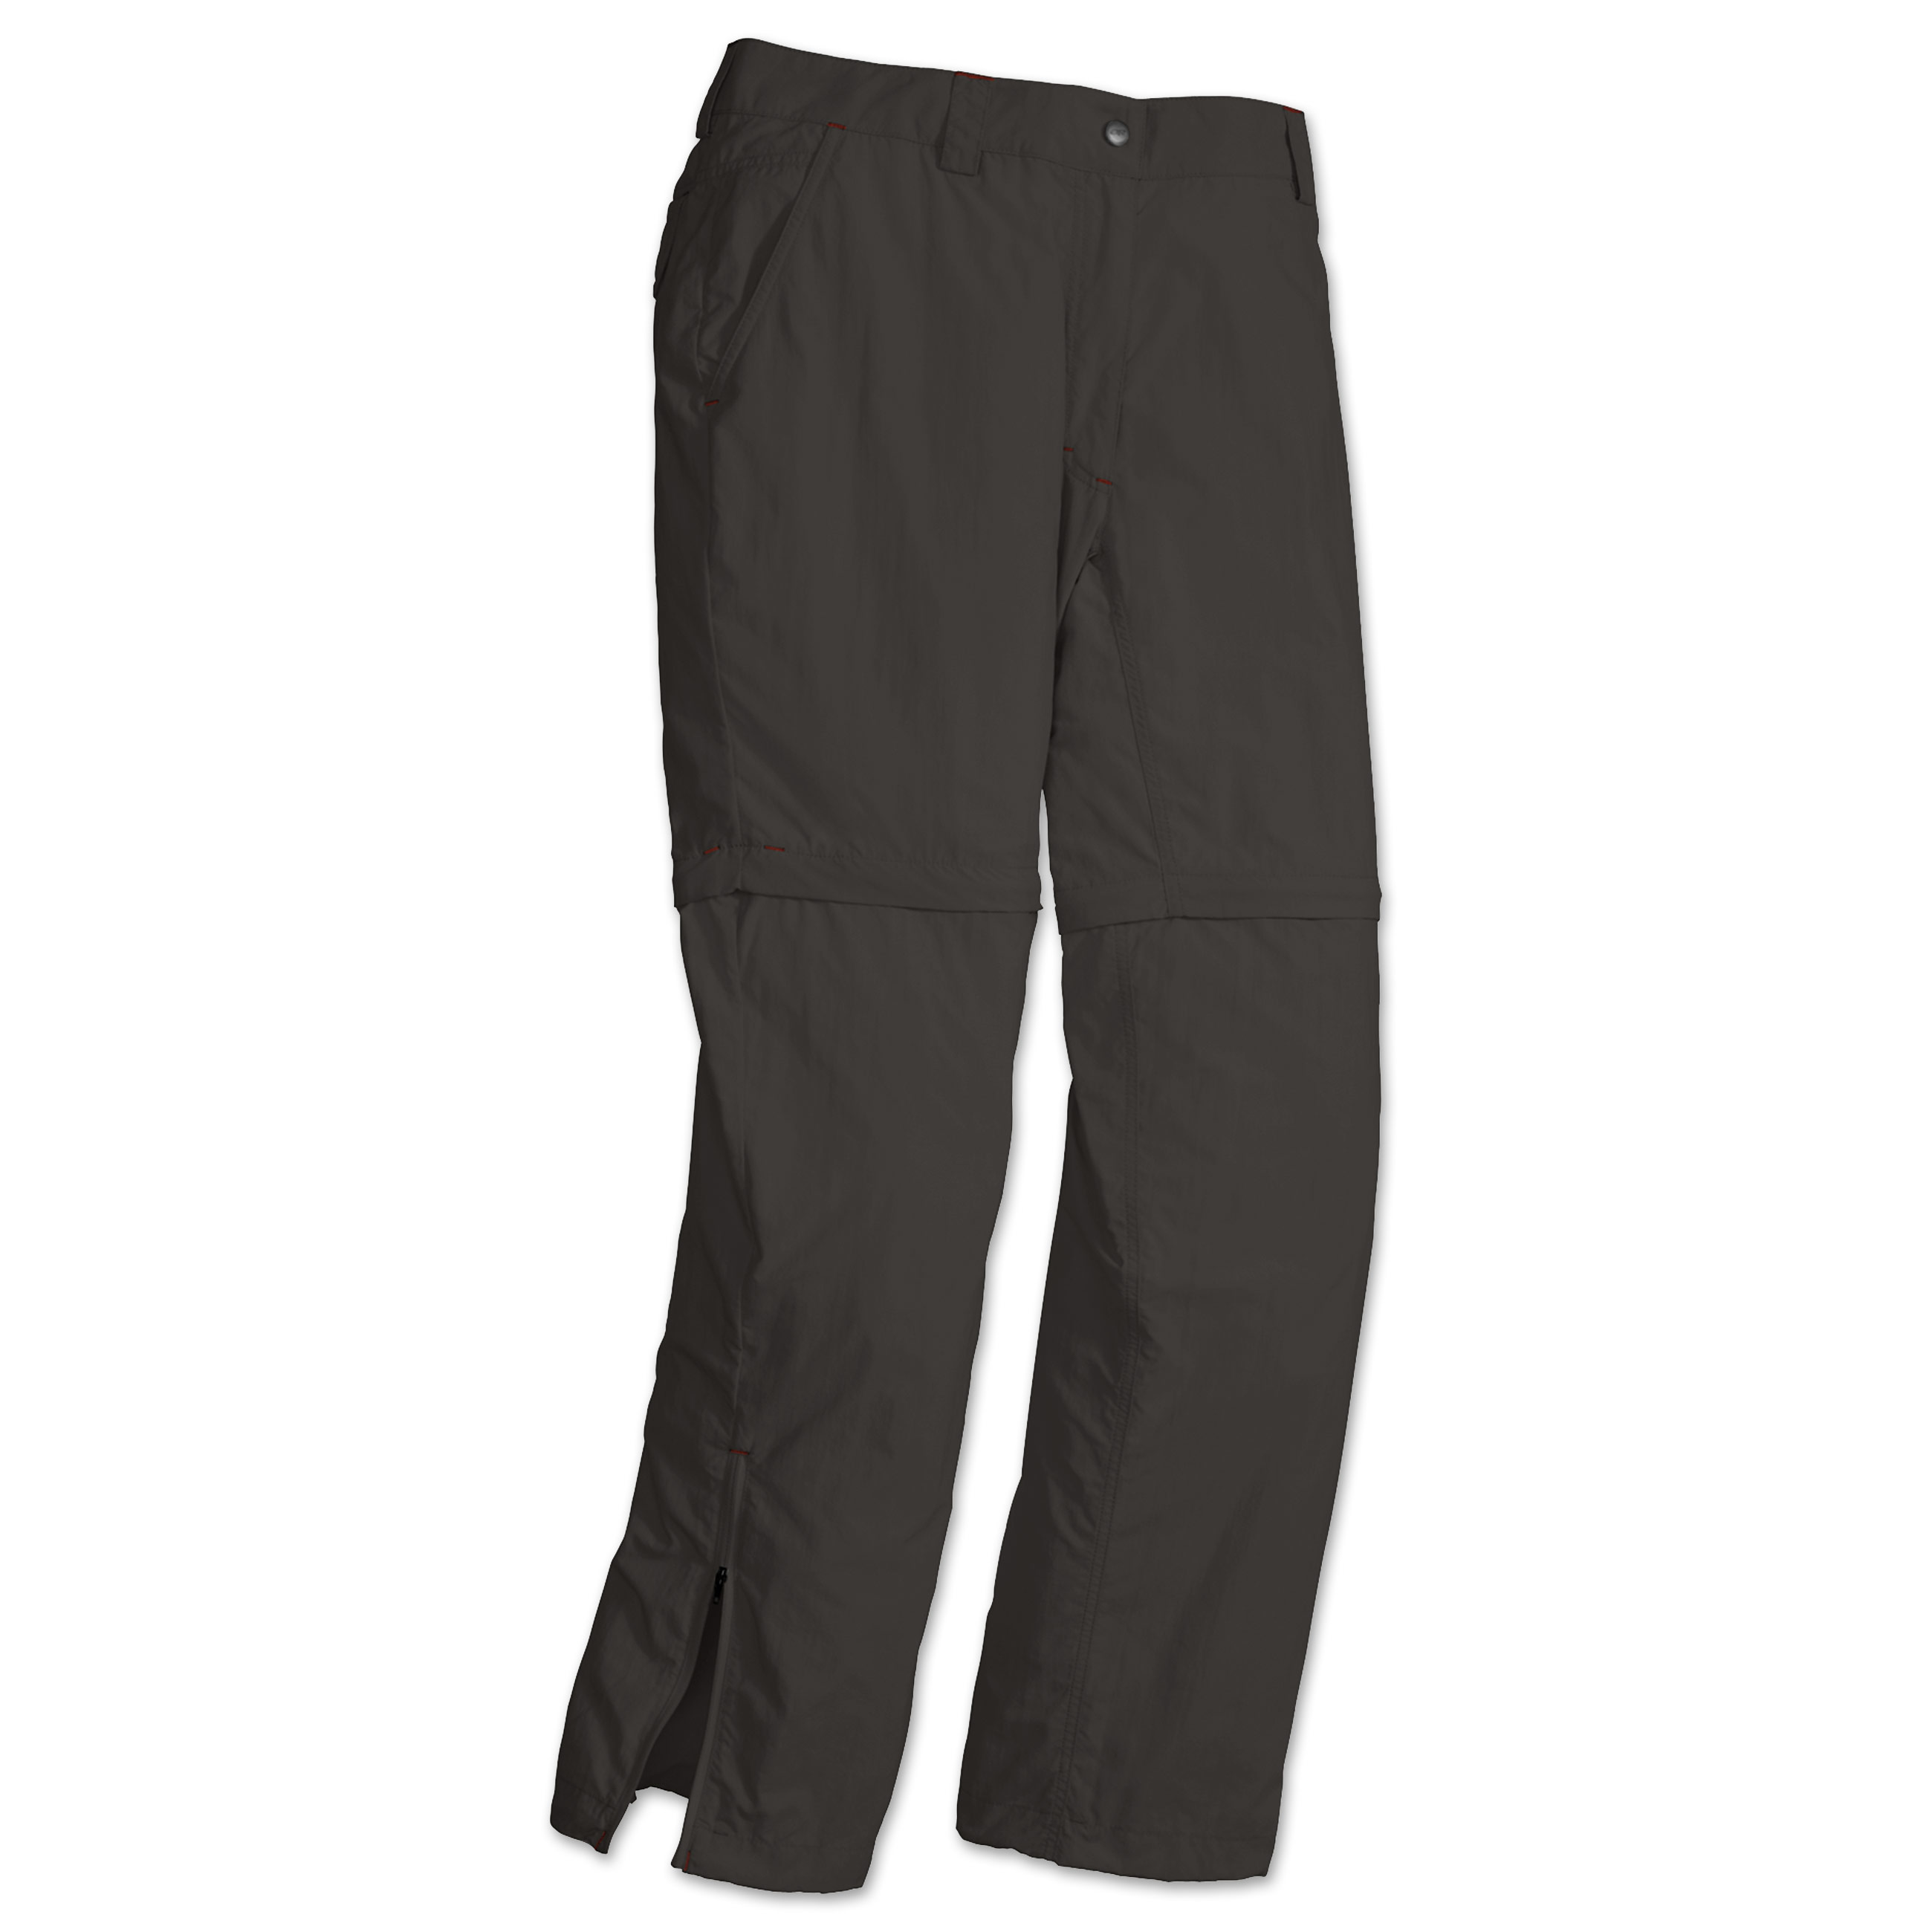 Men's Equinox Convert Pants